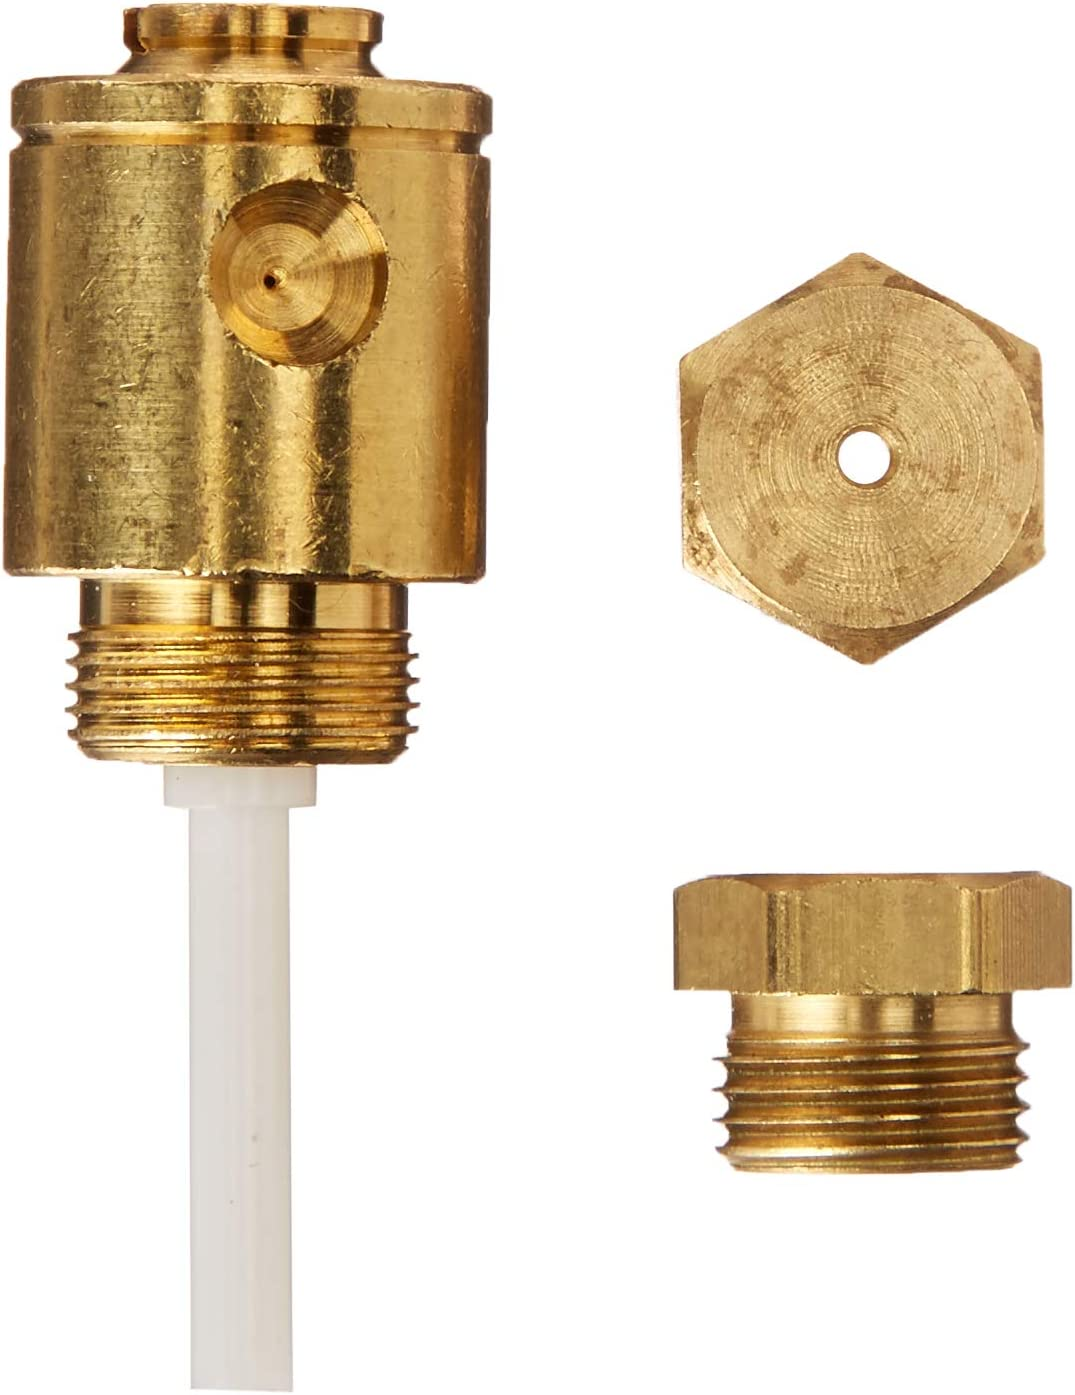 Whirlpool W10606694A LP Gas Conversion Kit: Home Improvement